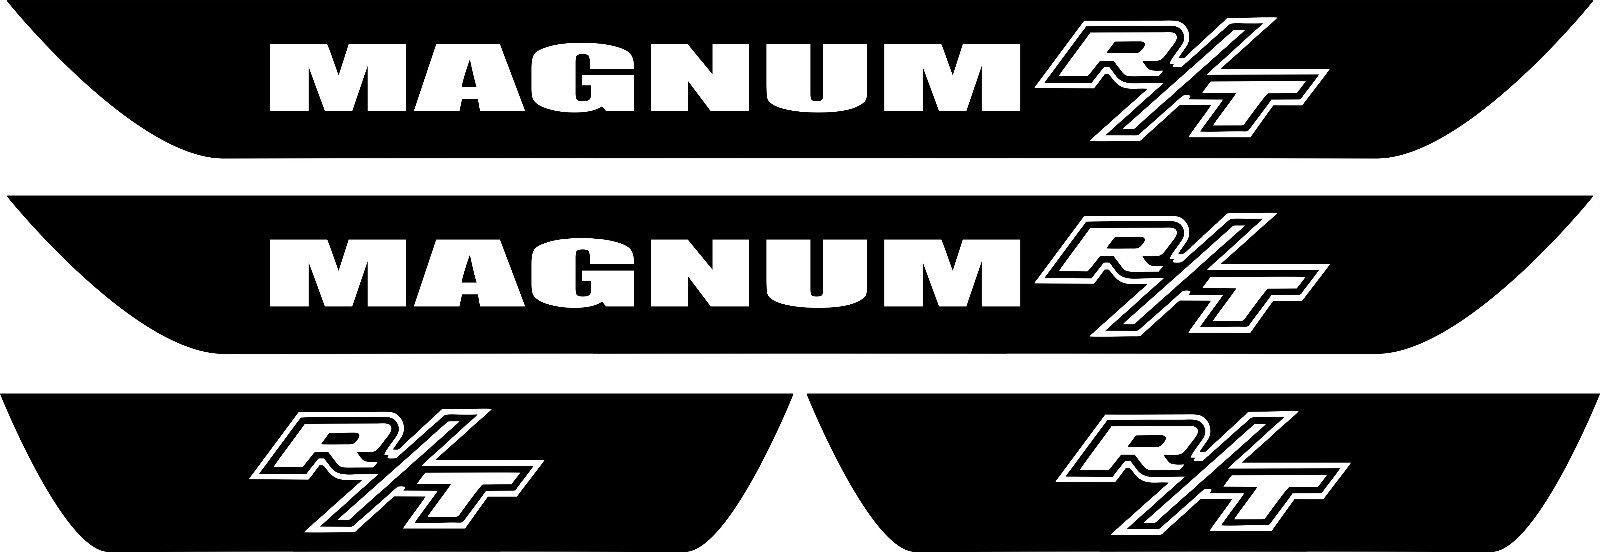 Dodge Magnum R-T Vinyl Türschwellen Aufkleber